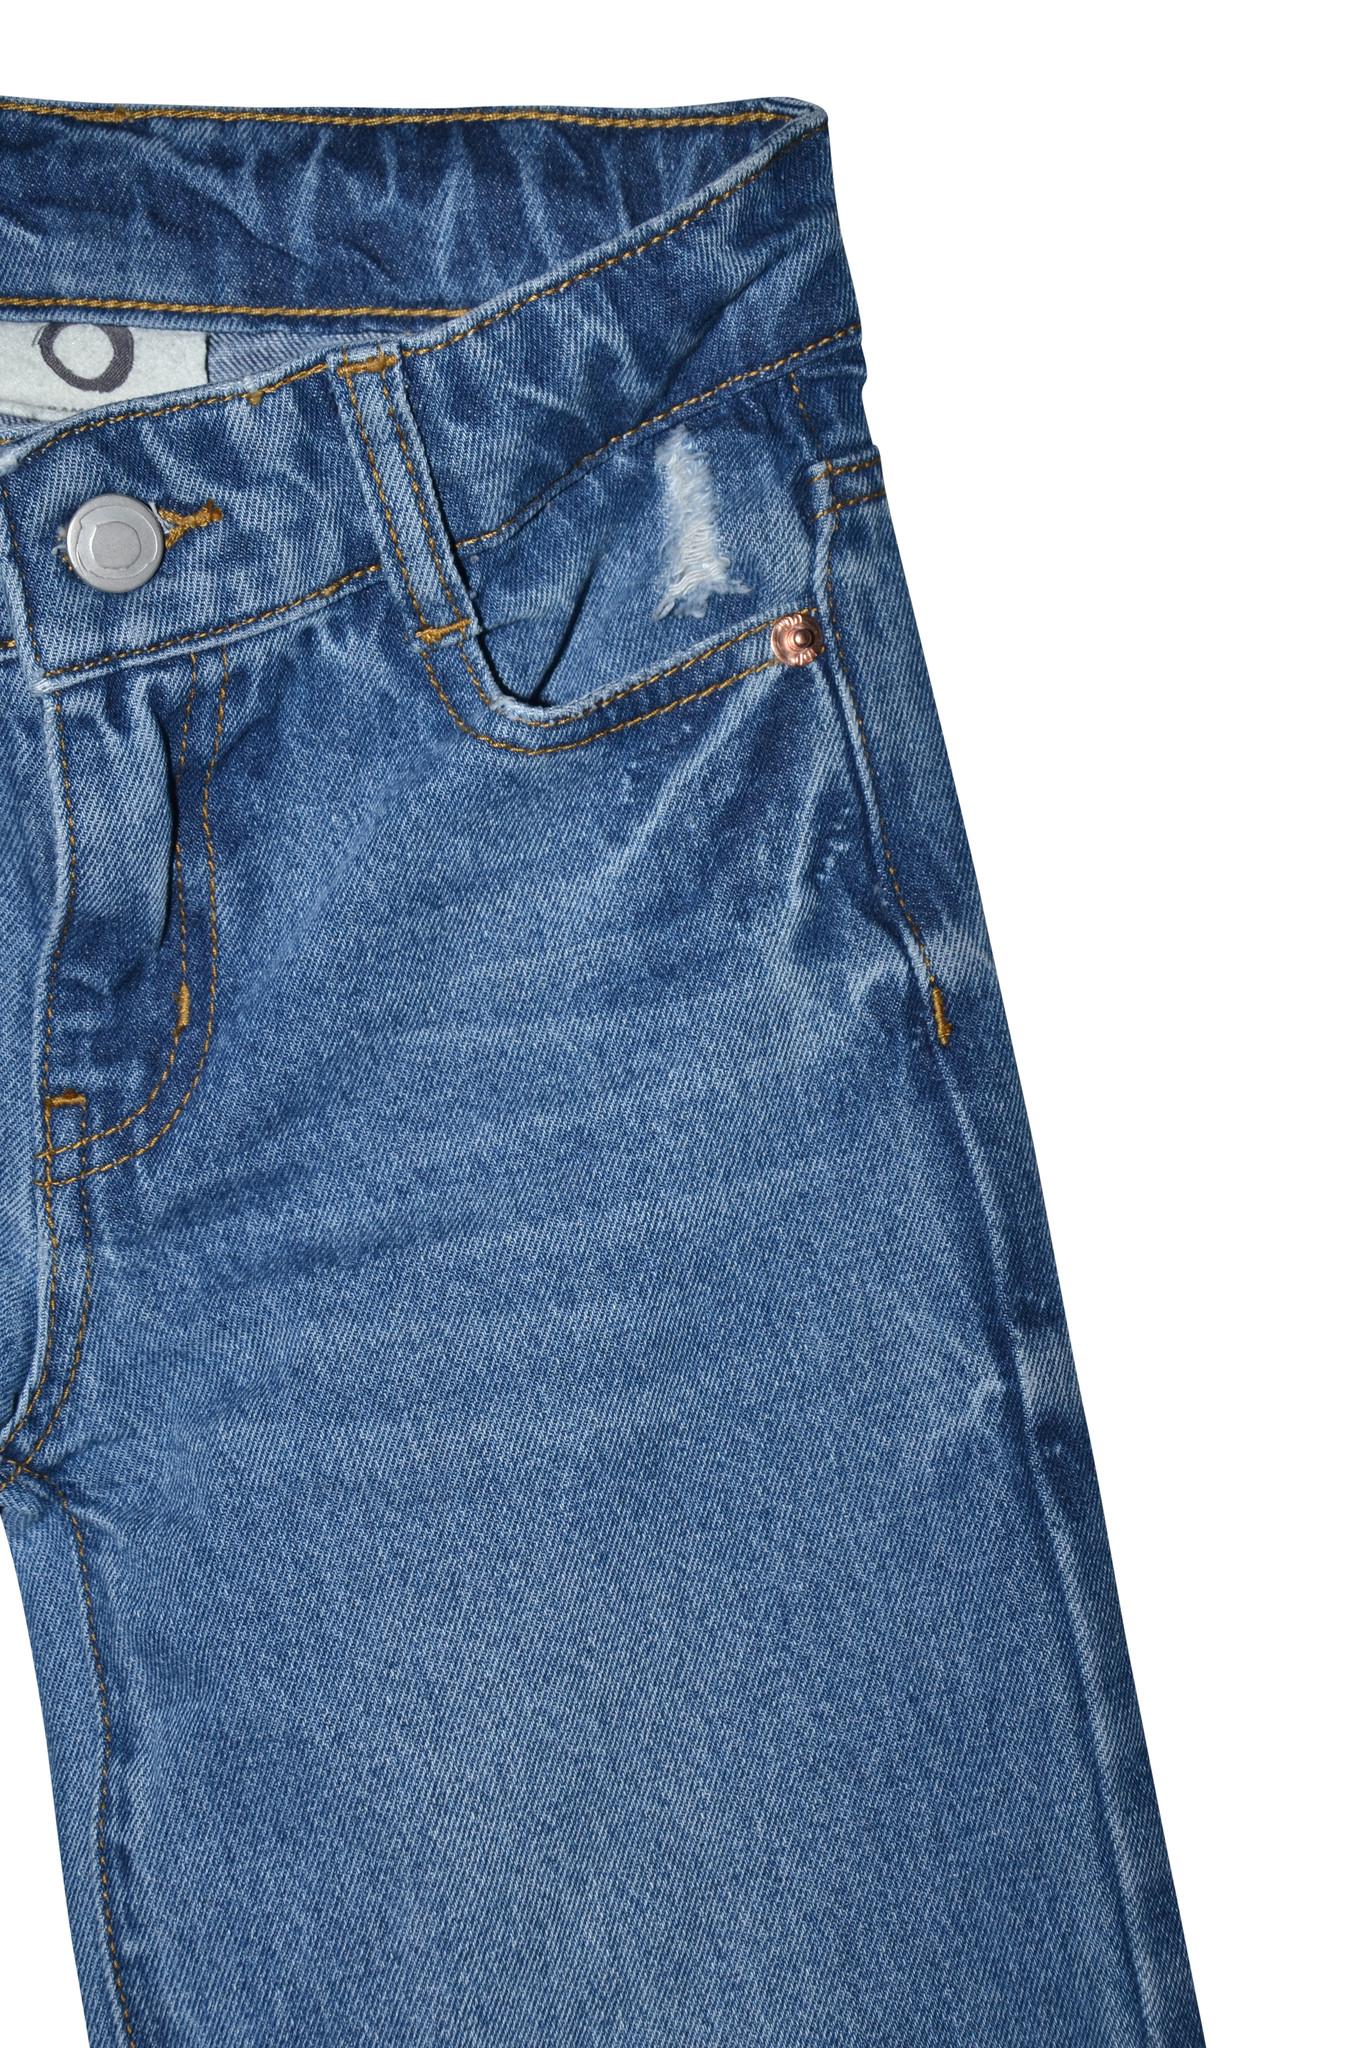 Stiles wide jeans-6